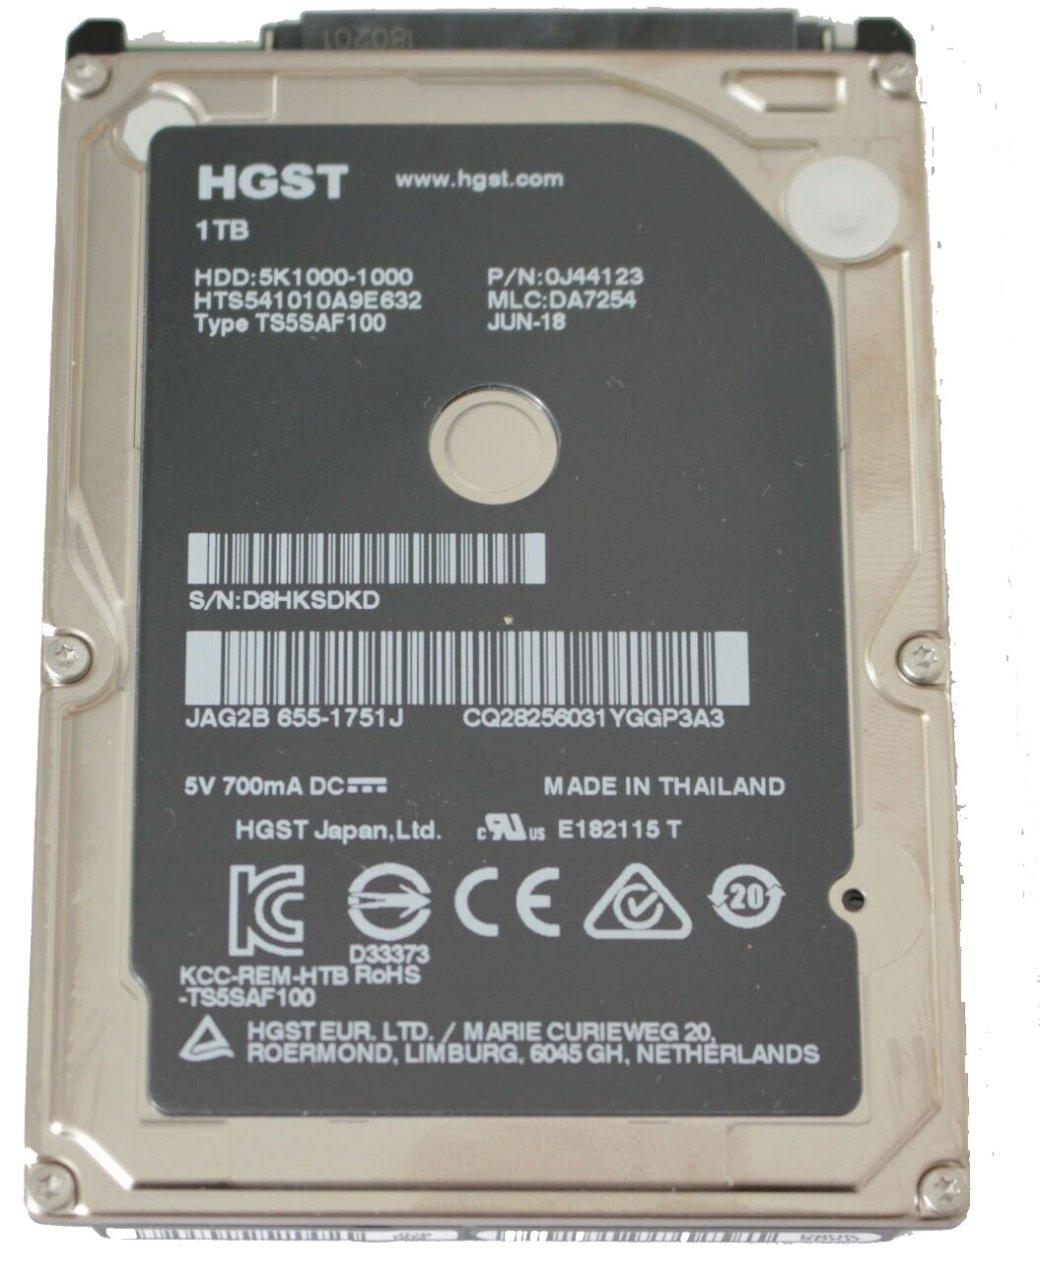 original Apple Hard Drive, 1 TB, SATA, 2.5, 5400 661-7107